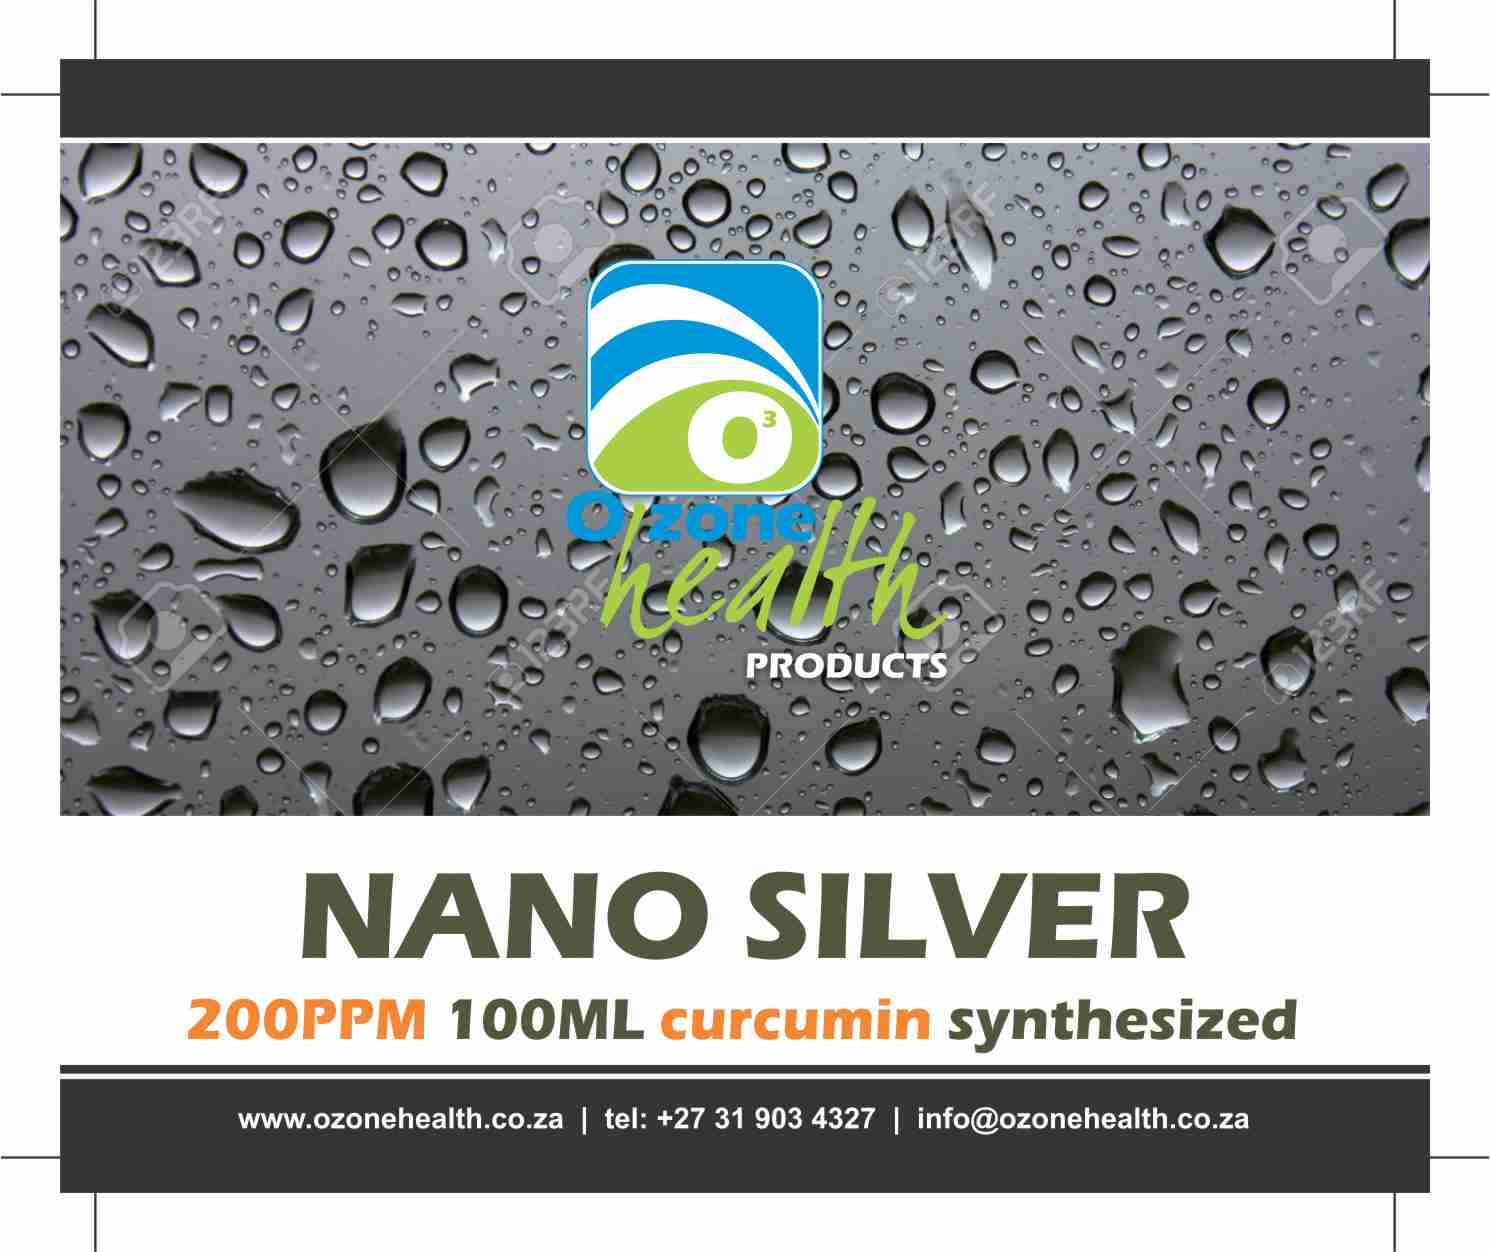 Nano Silver - 200ppm Curcumin Synthesized [object object] Medical Shop Silver nano curcumin 100